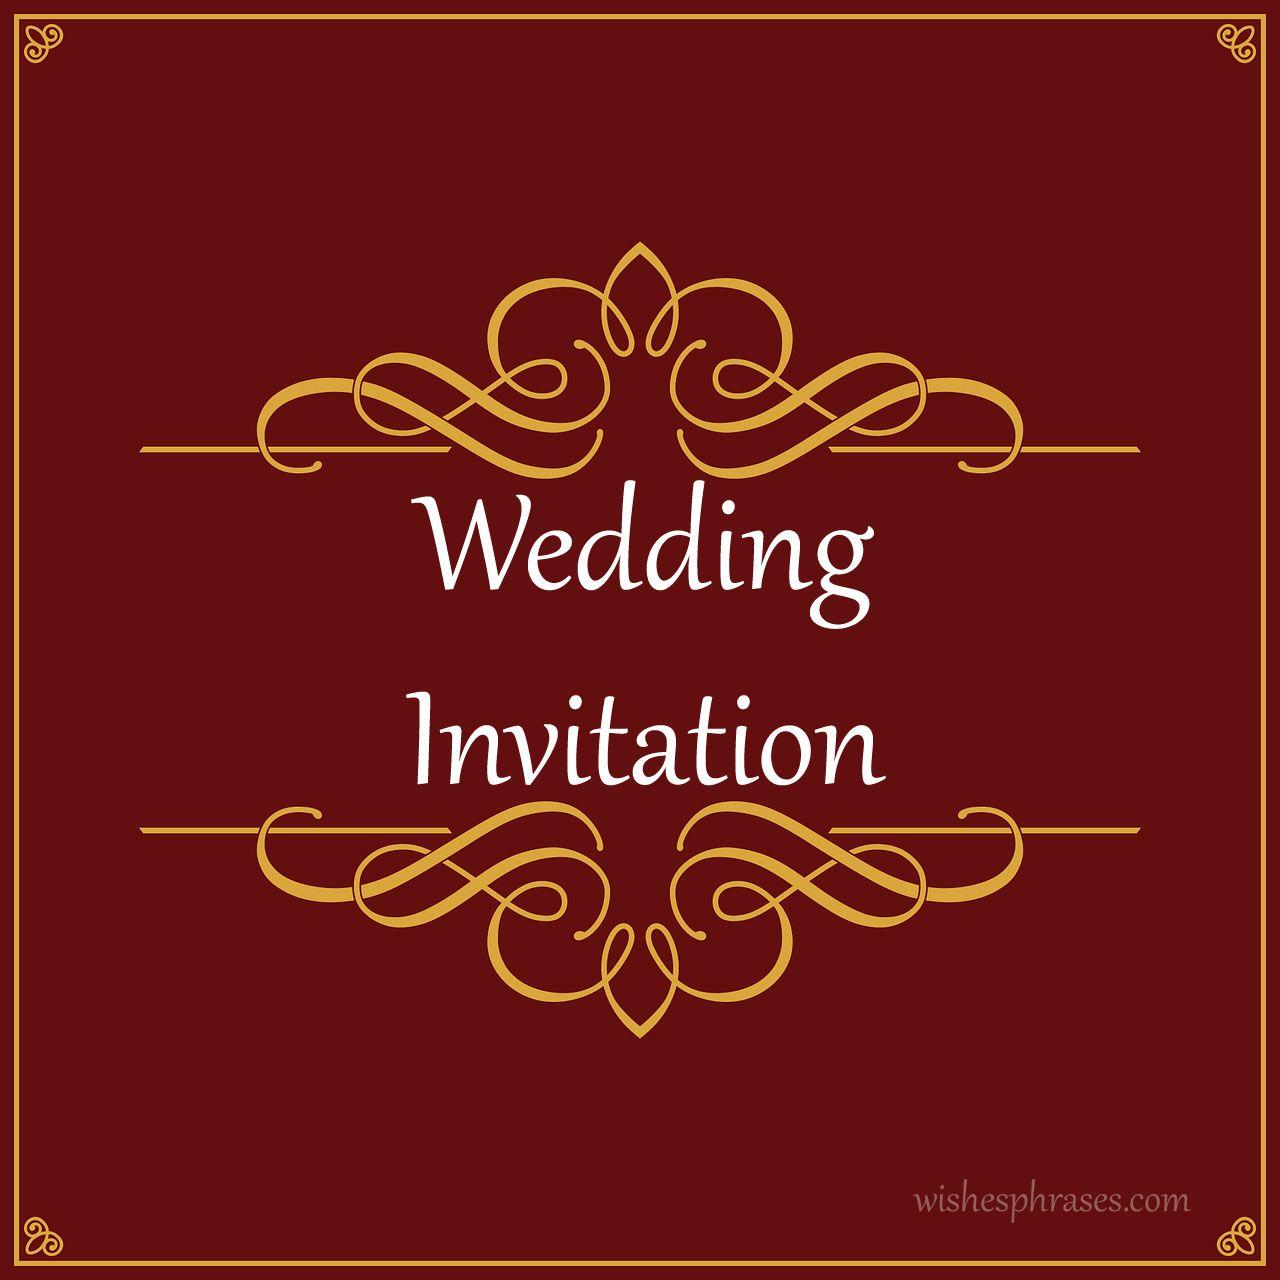 Indian Wedding Invitation Wording | Messages | Pinterest | Indian ...